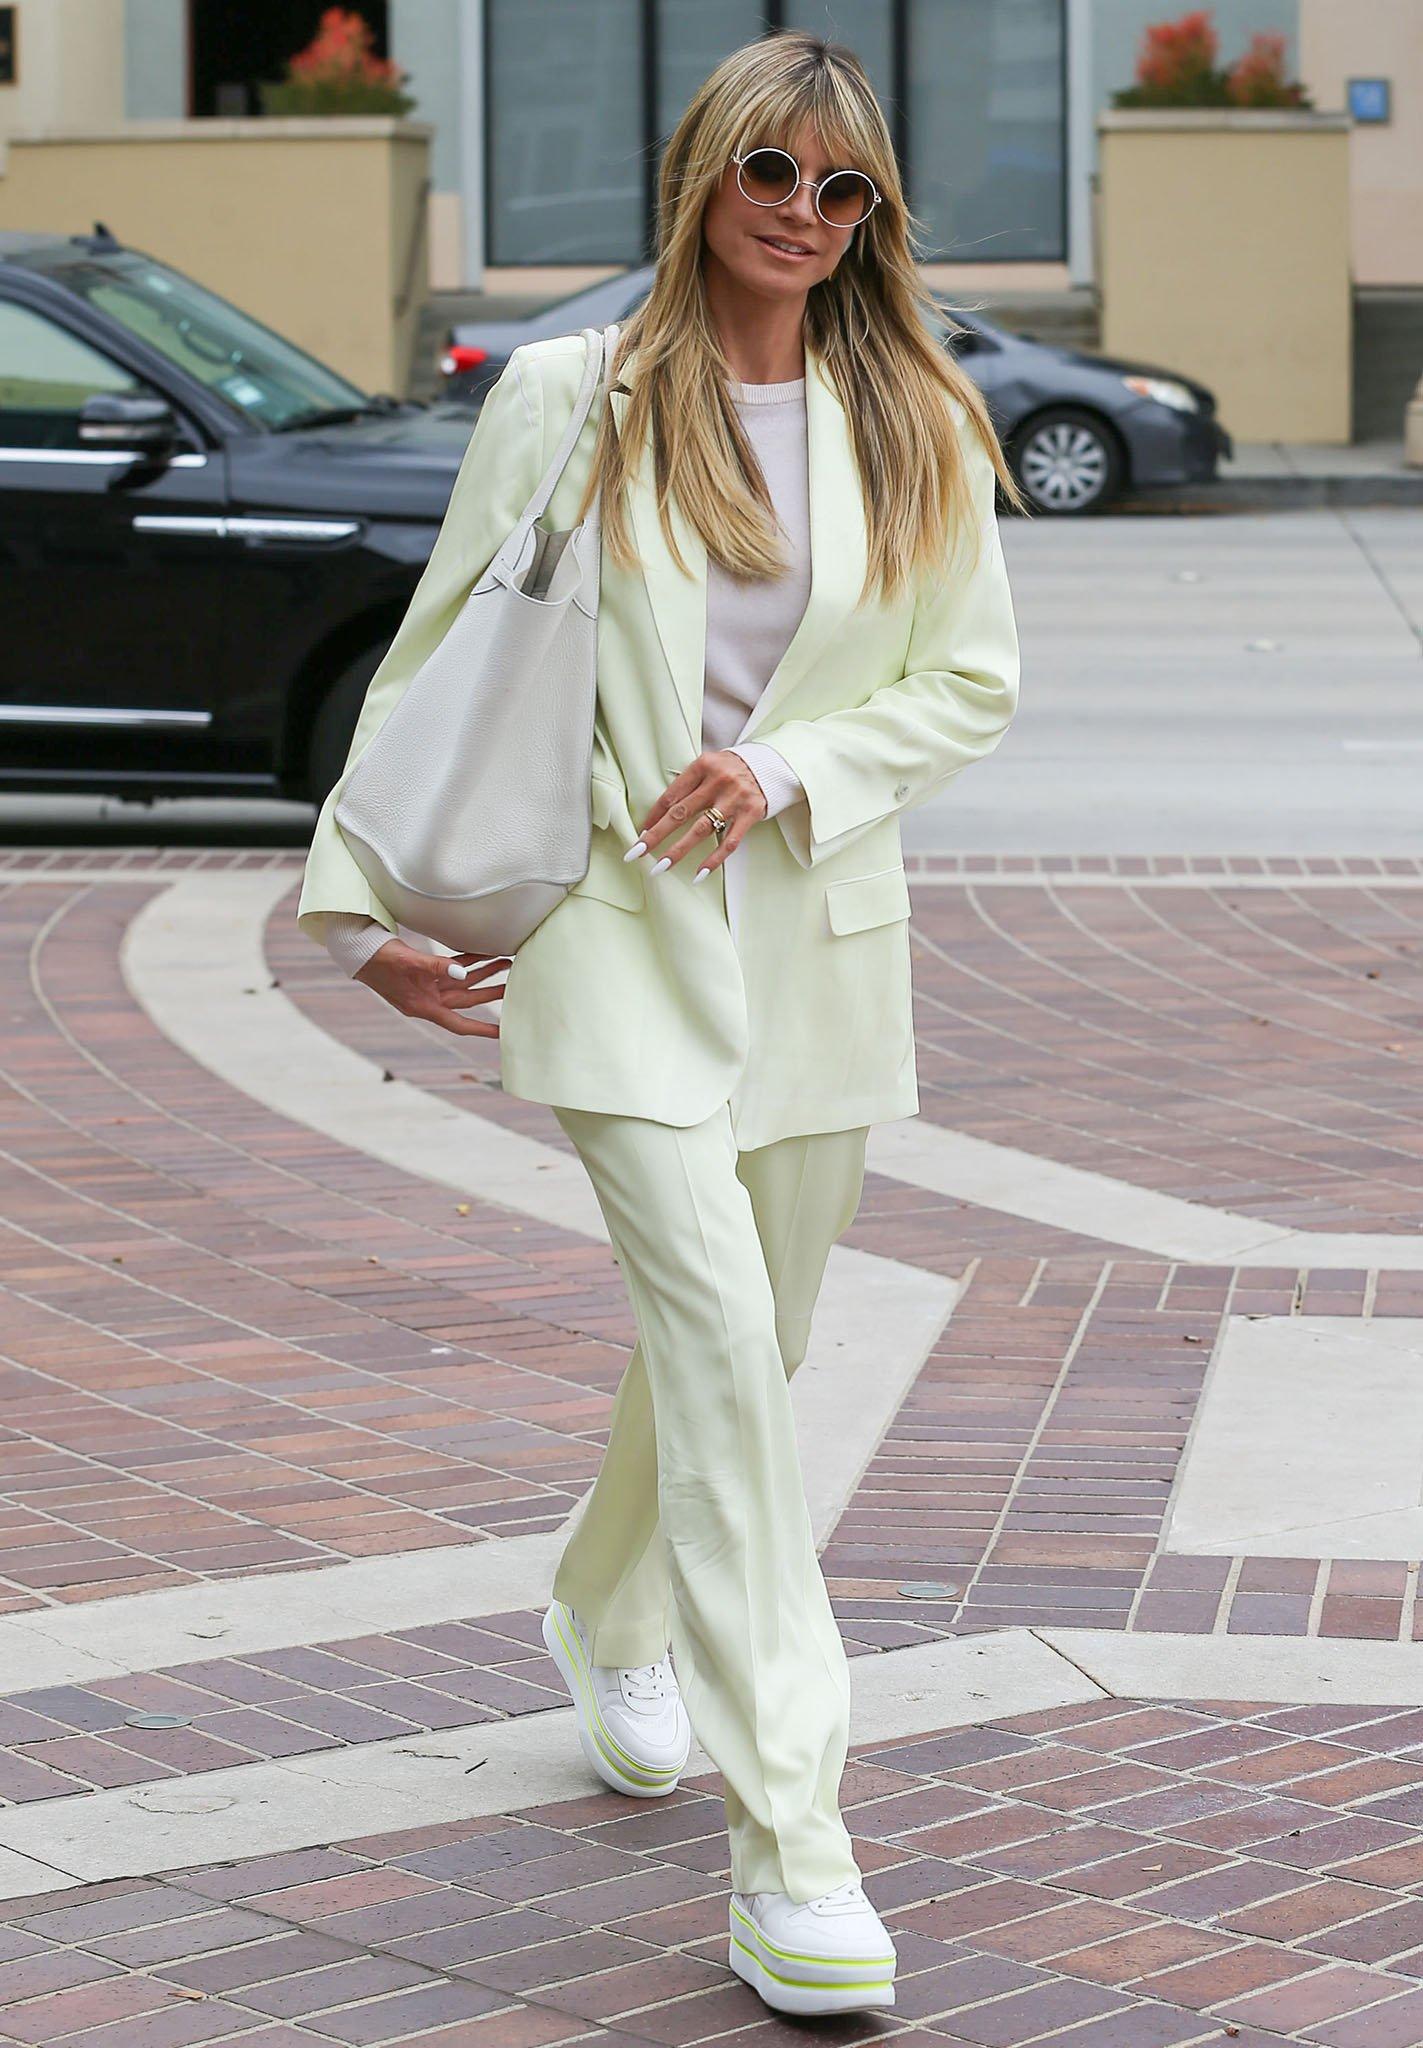 Heidi Klum looks spring chic in honeydew pantsuit on April 23, 2021